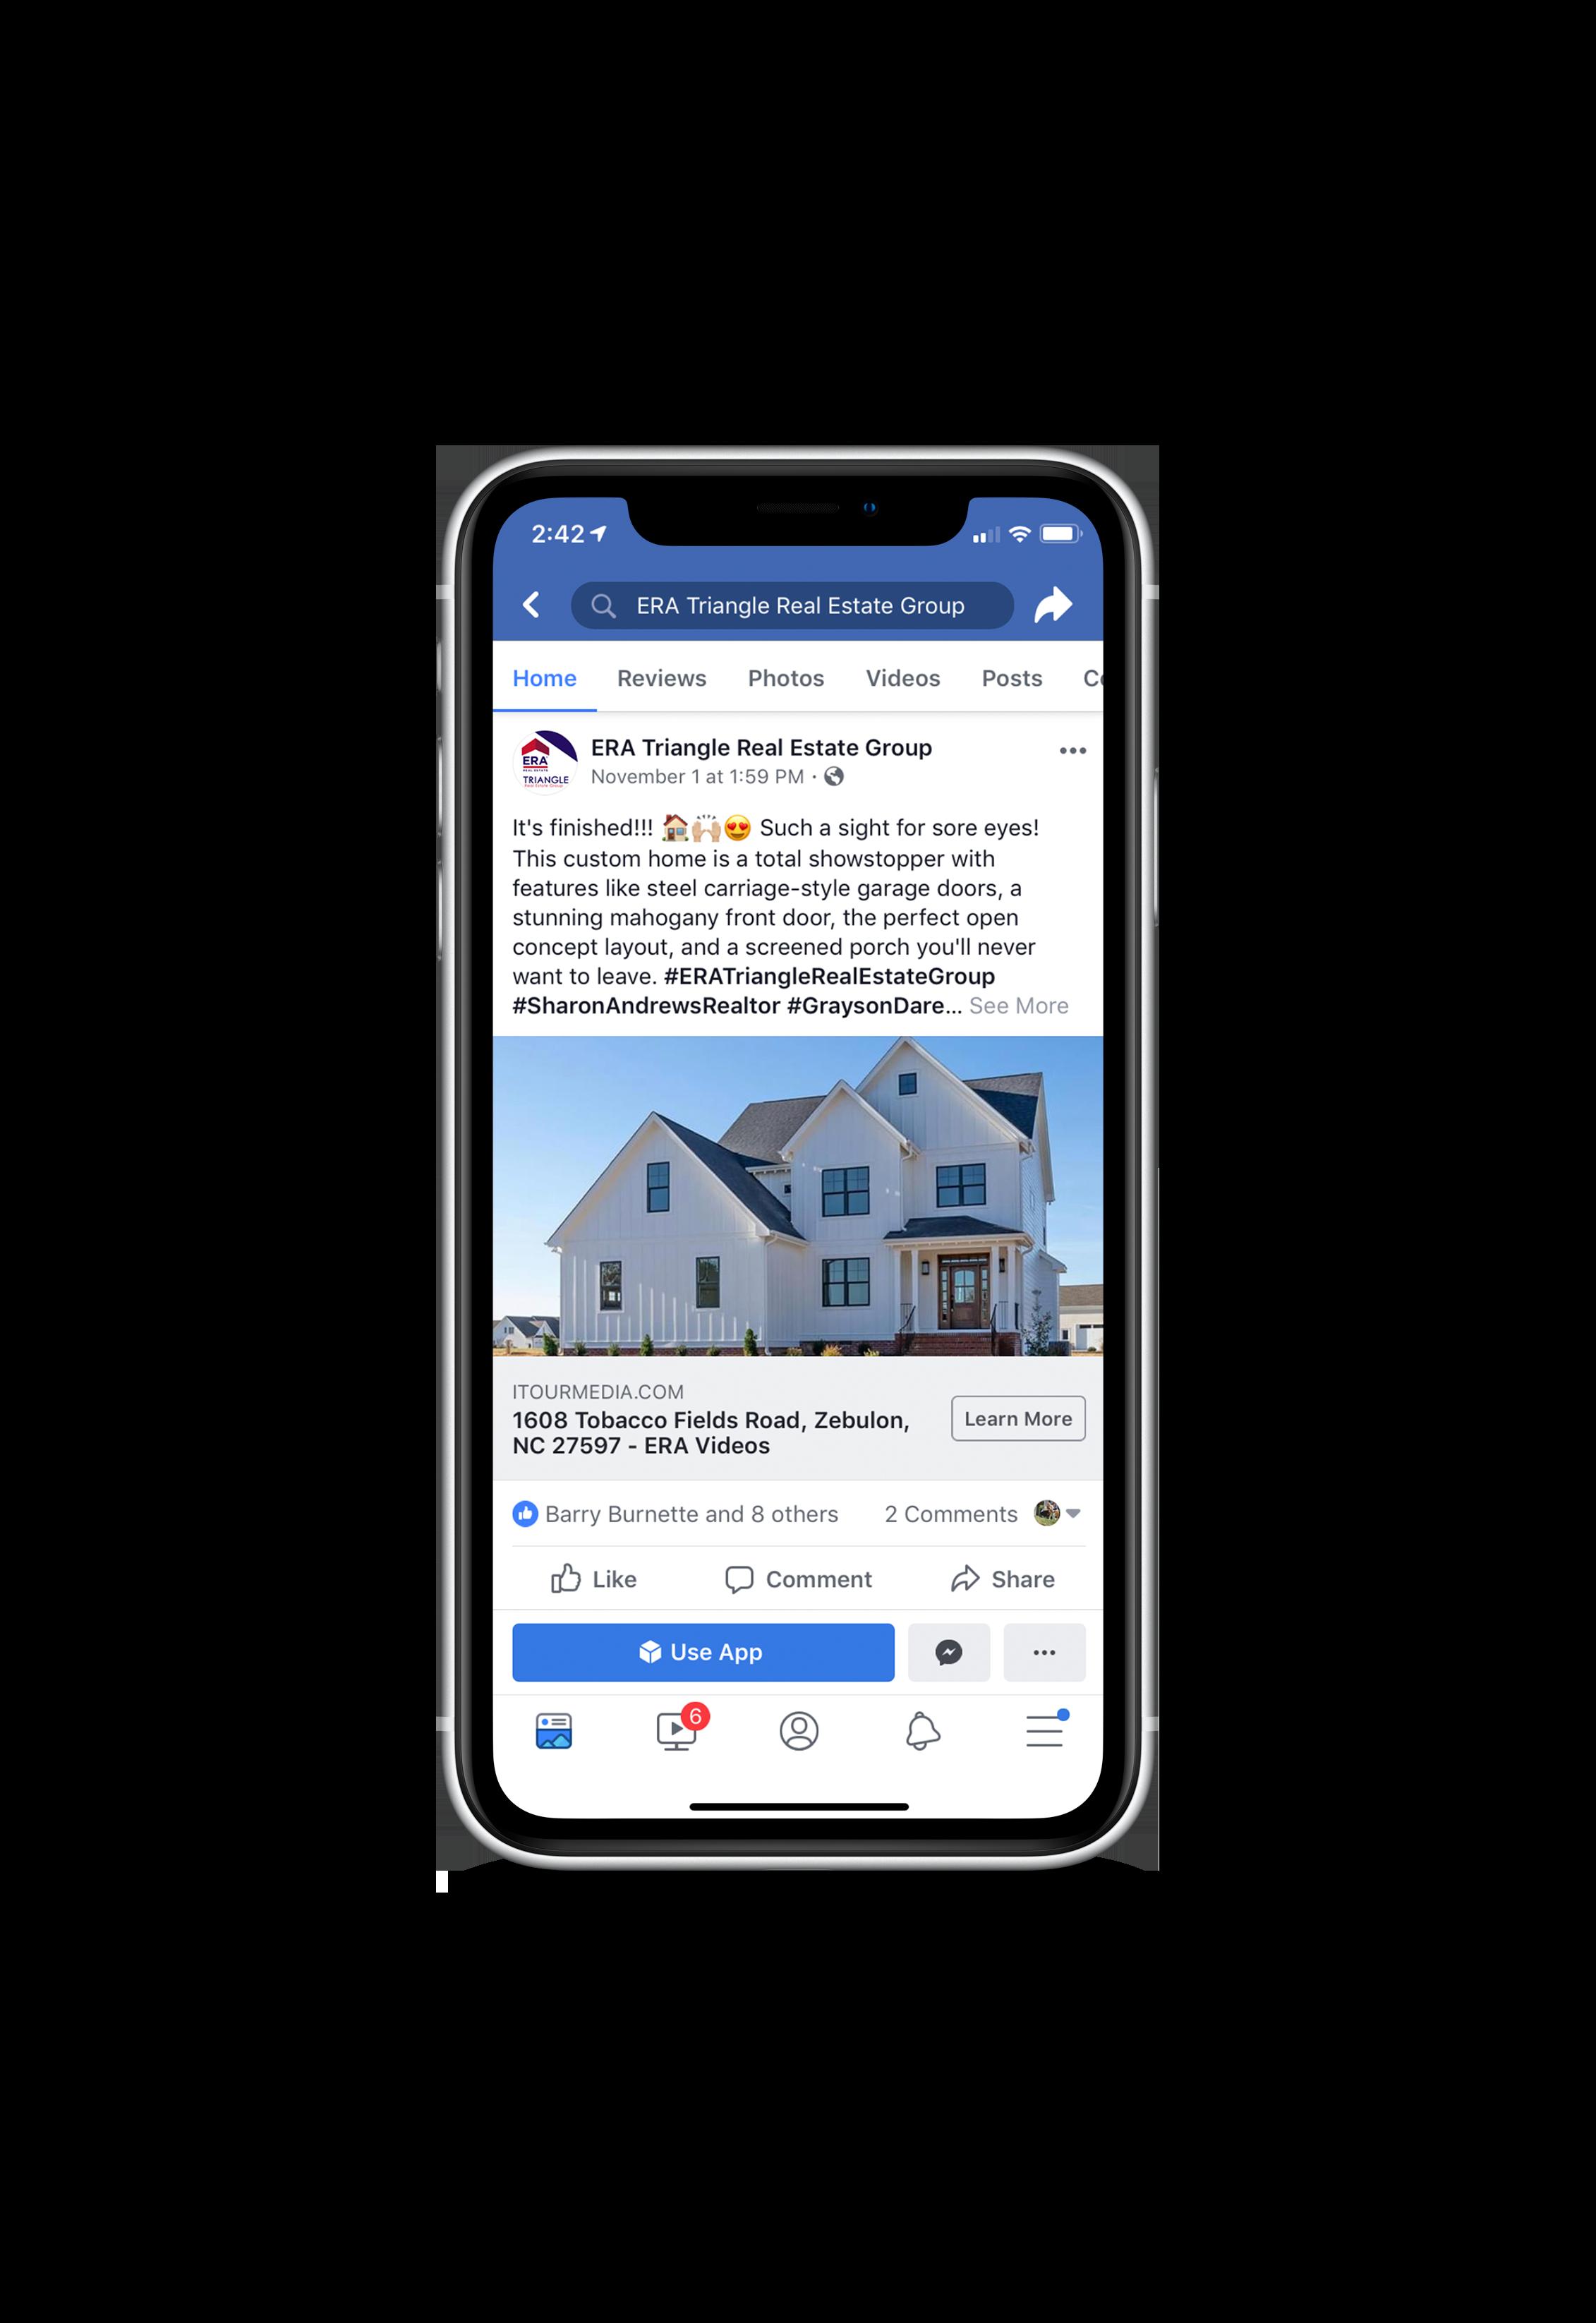 ERA Triangle Real Estate Group Social Media